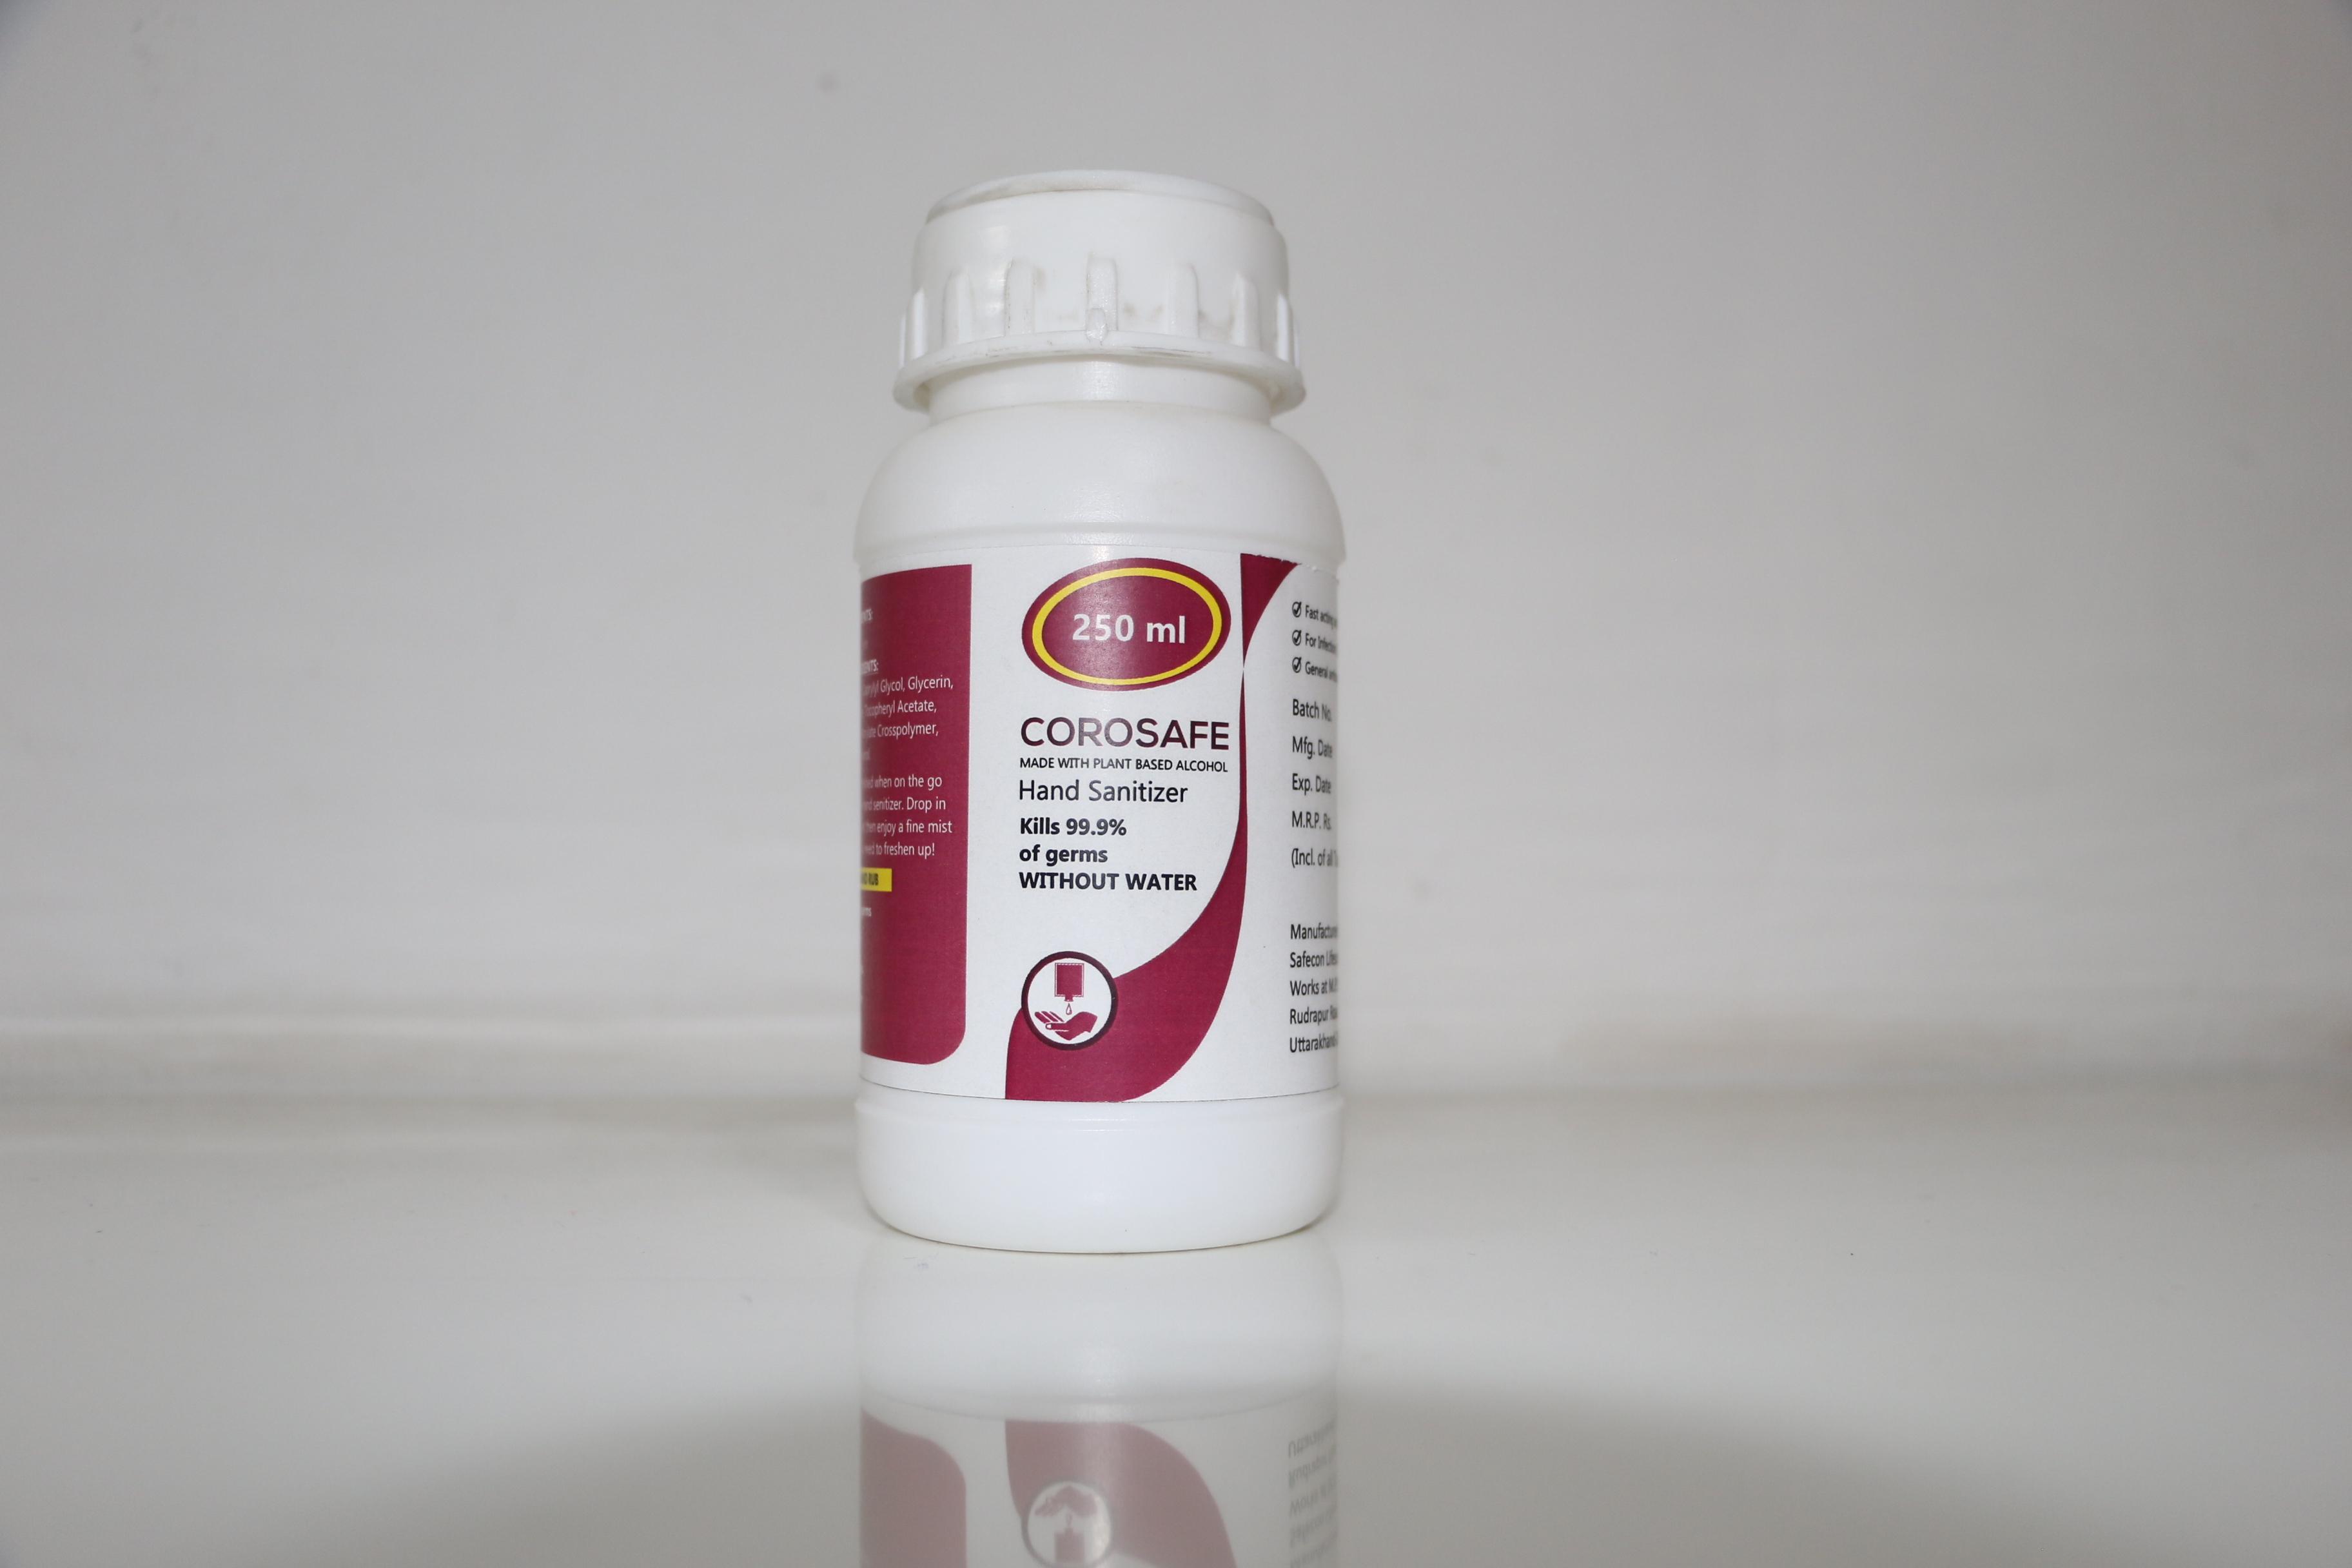 Corosafe Hand Sanitizer